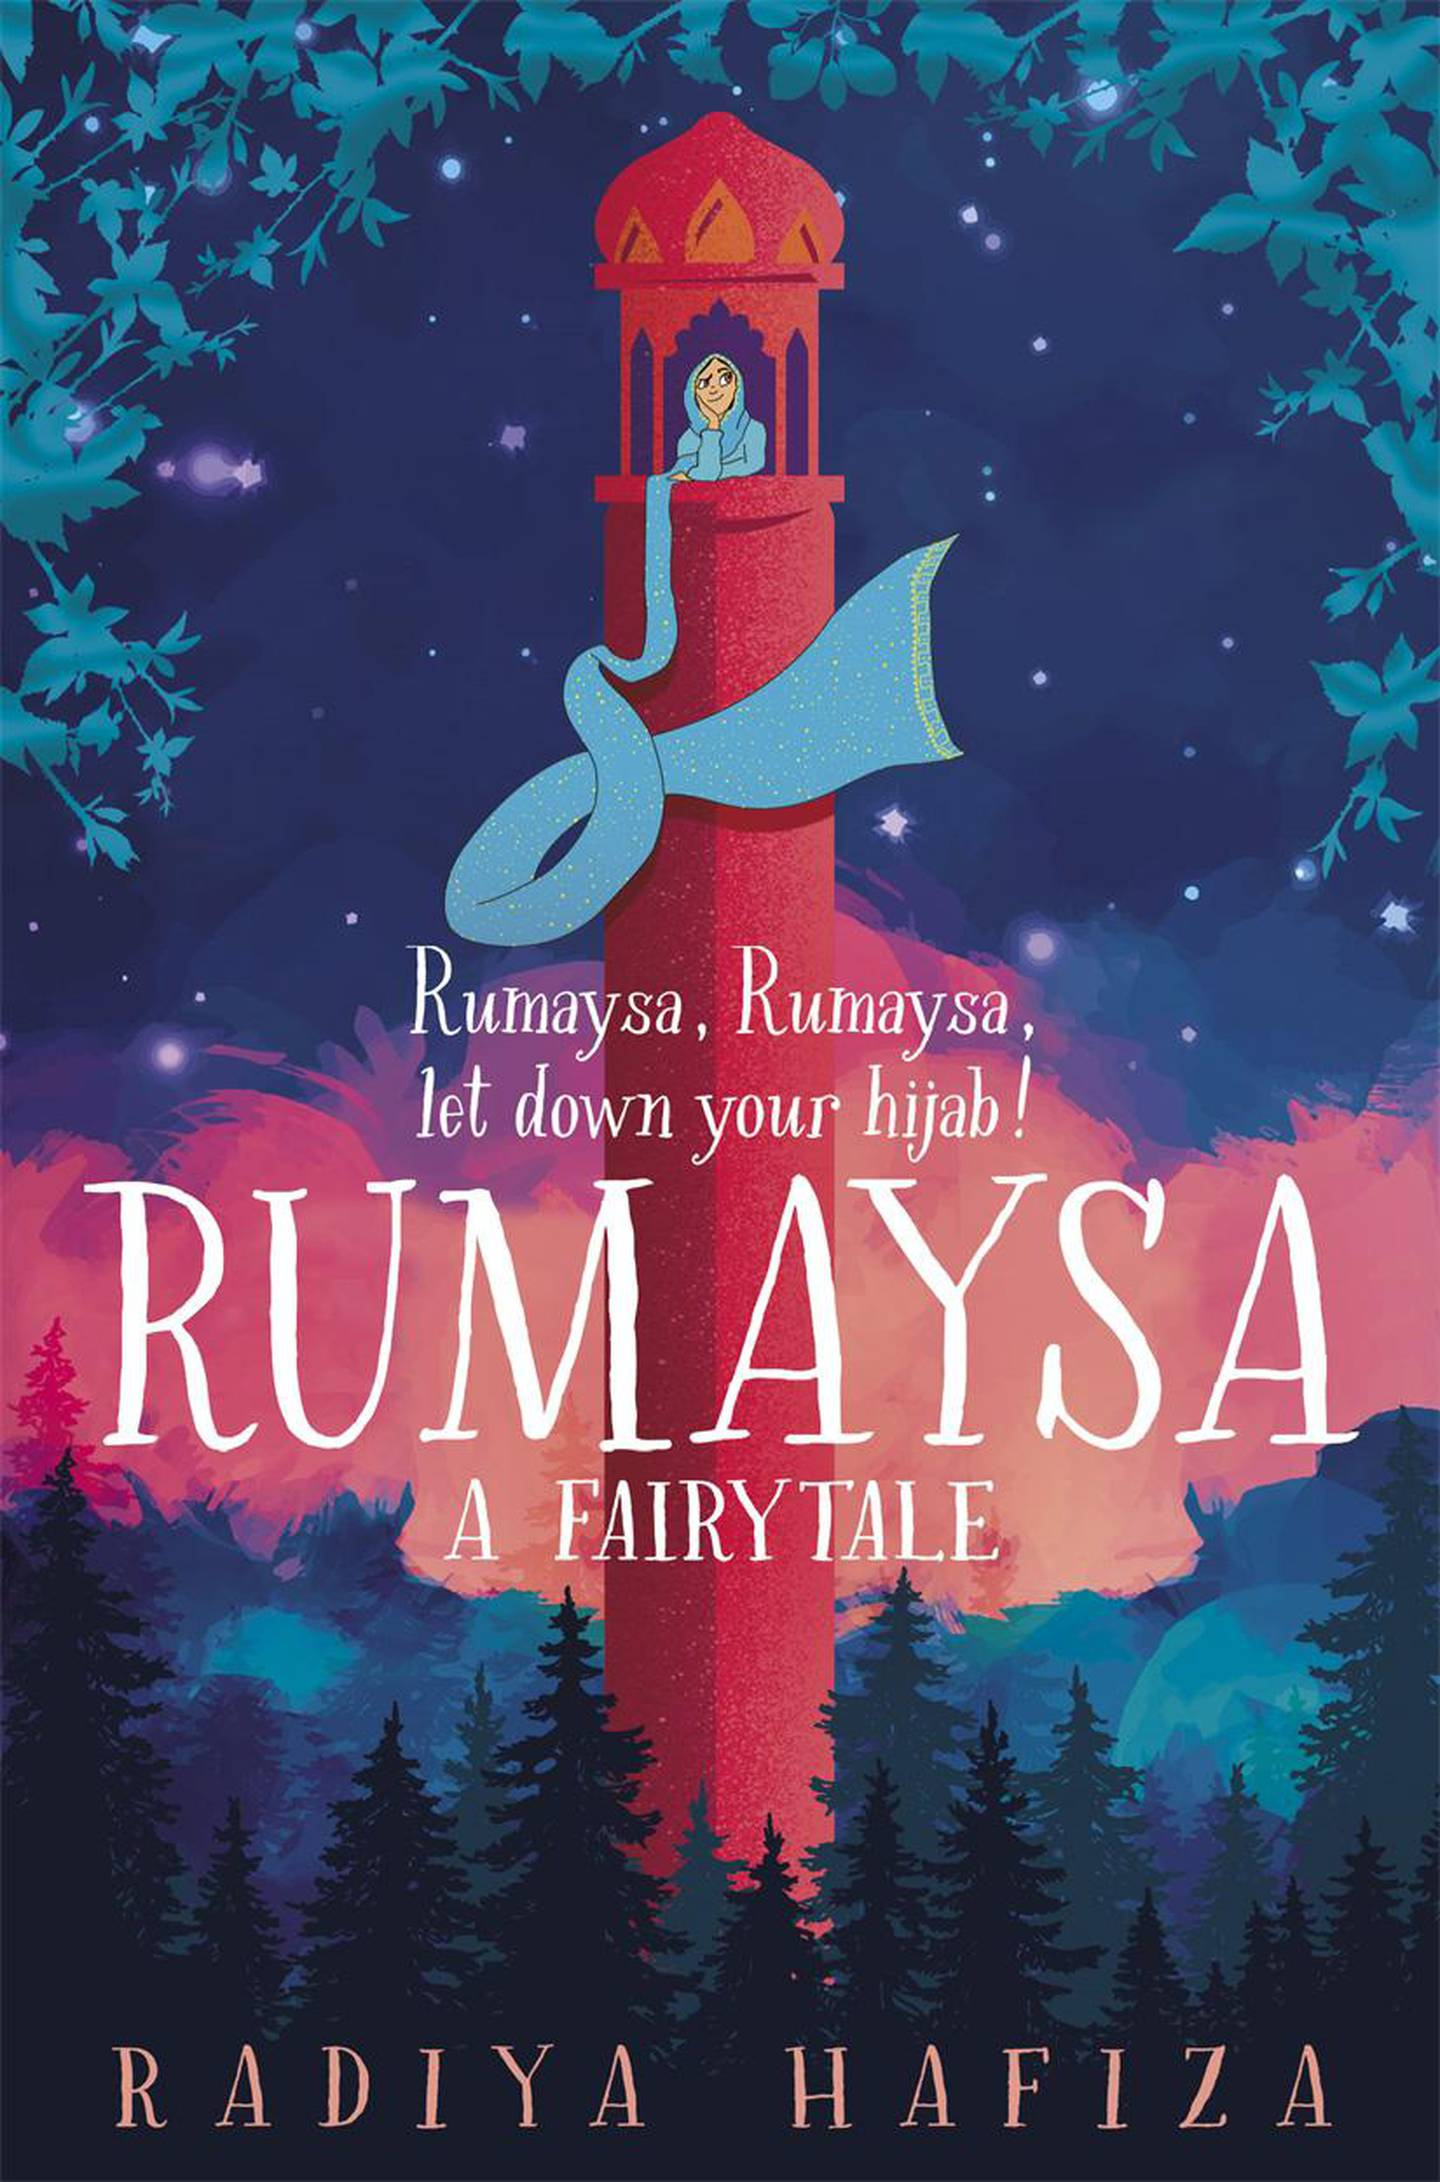 Rumaysa by Radiya Hafiza. Courtesy Macmillan Children's Books